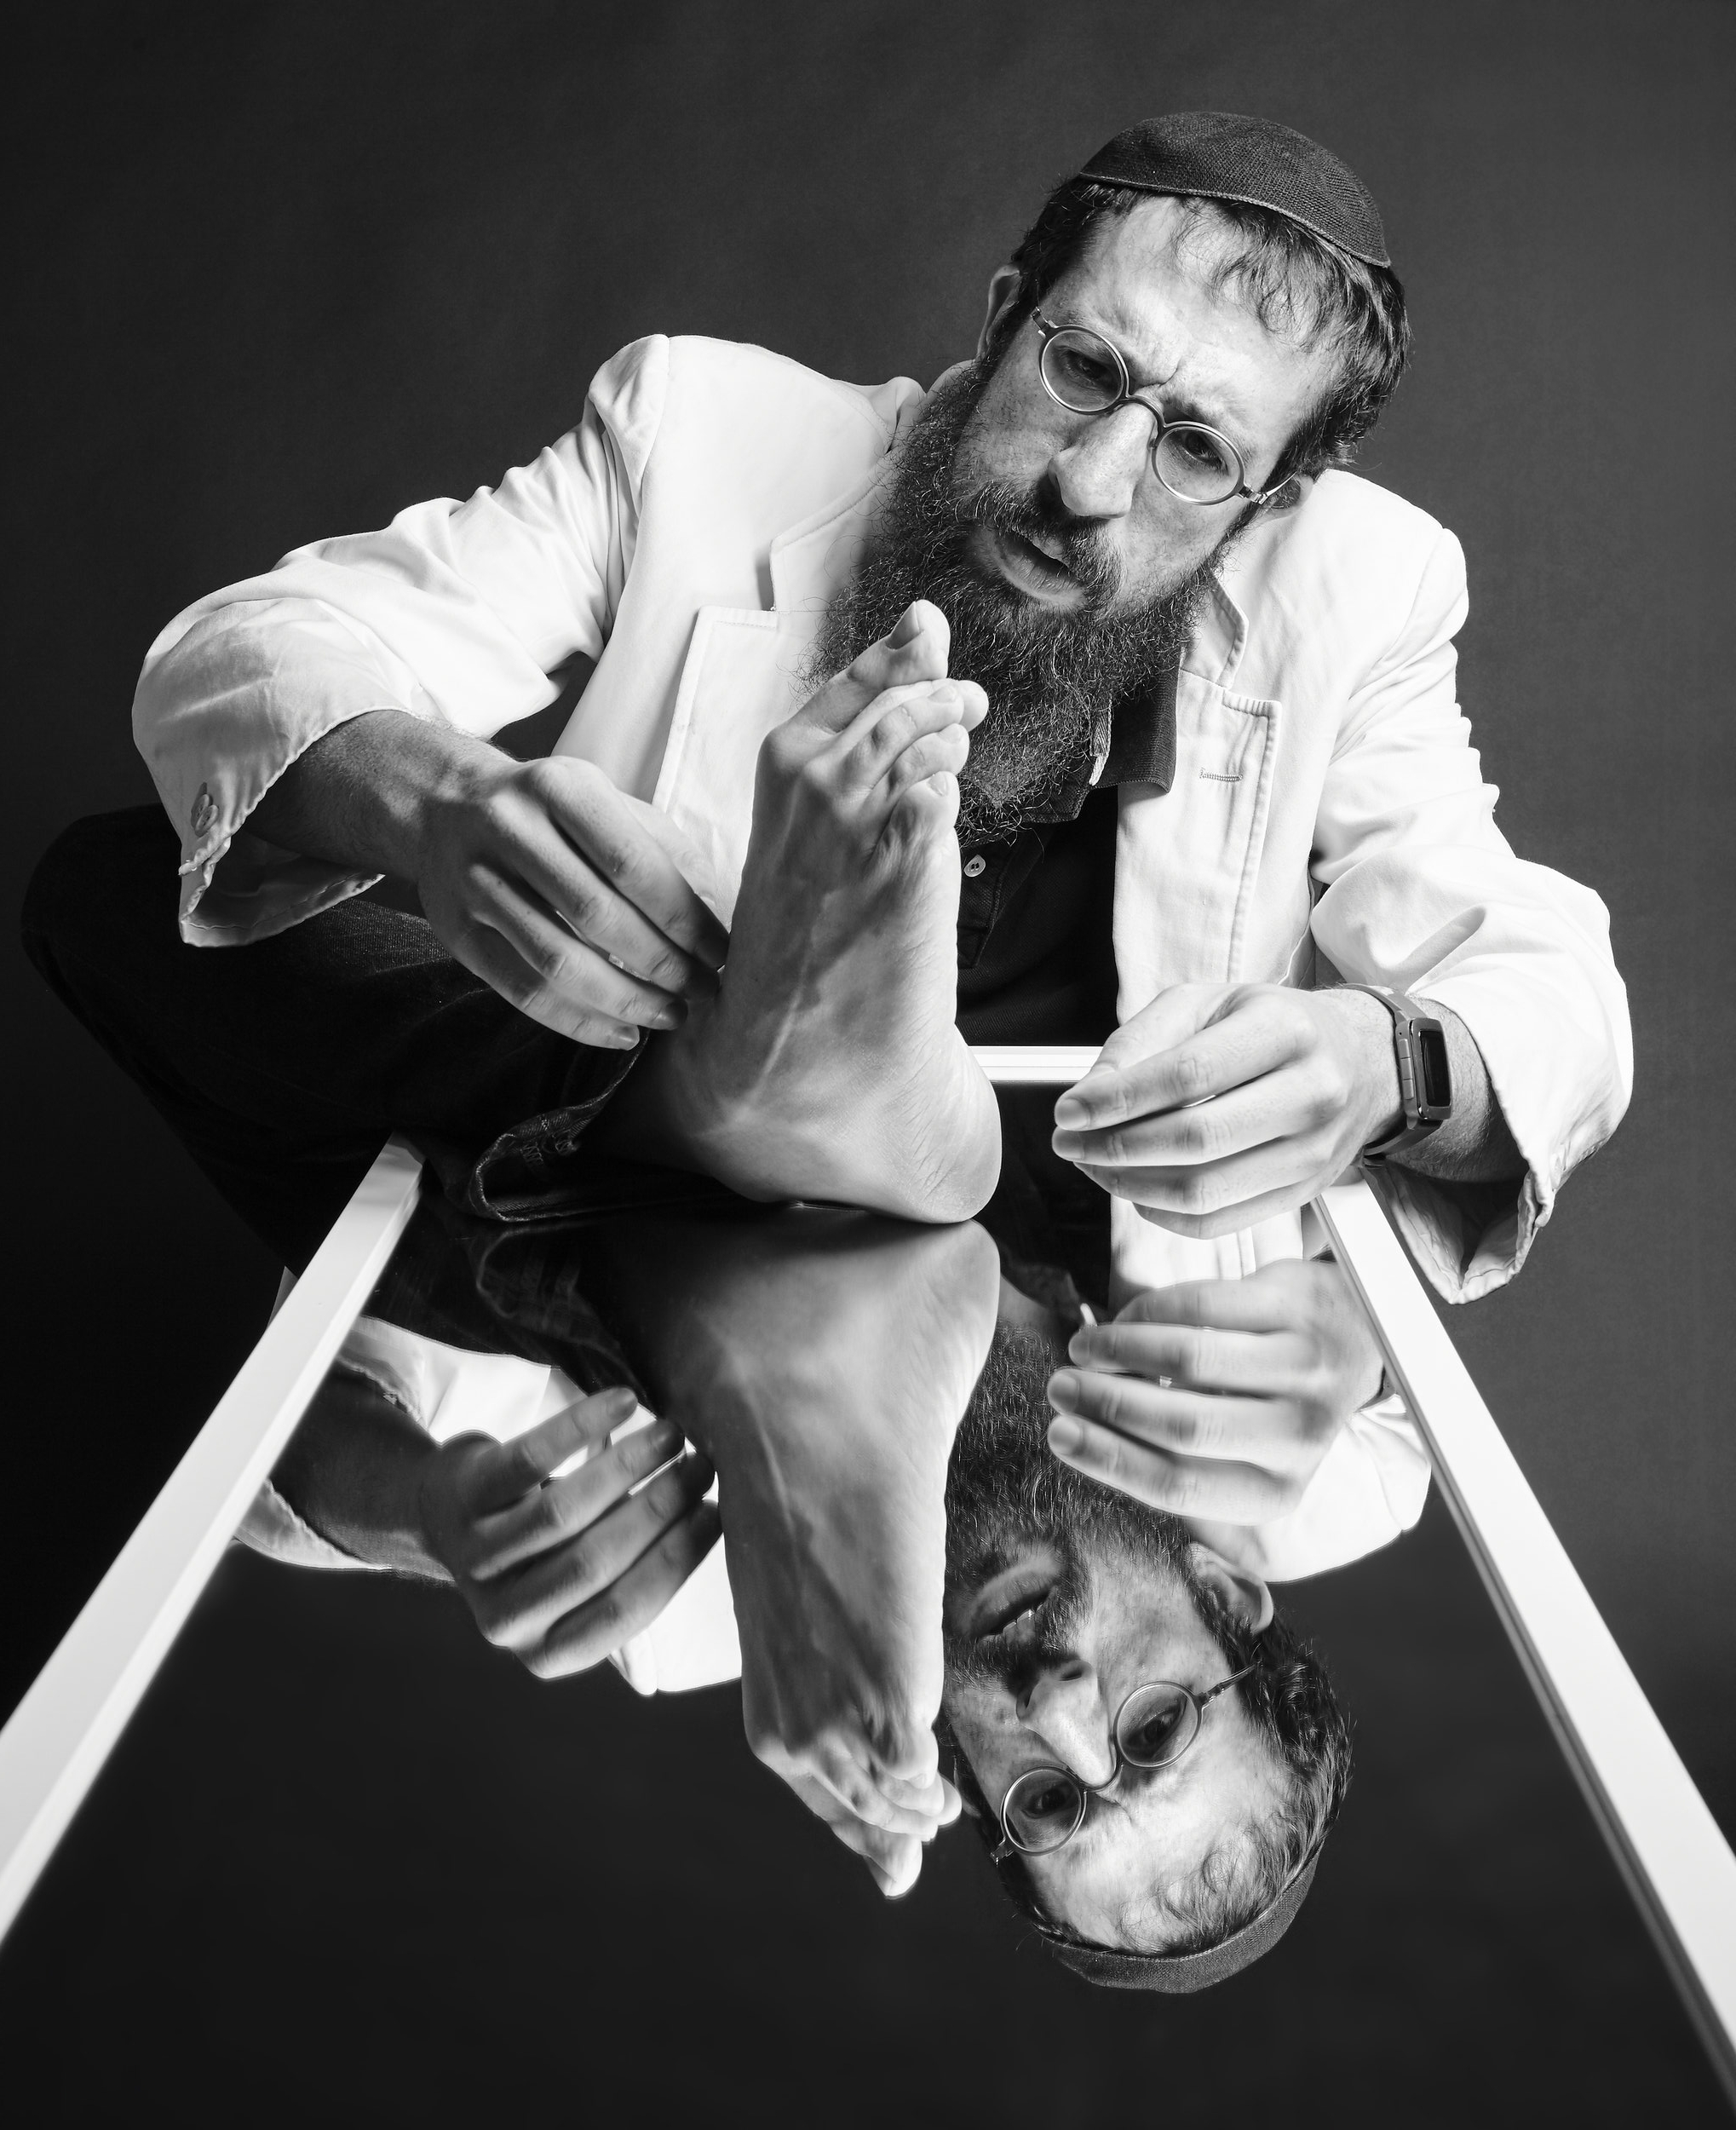 MENDY PELLIN, COMEDIAN, ACTOR, FILM DIRECTOR